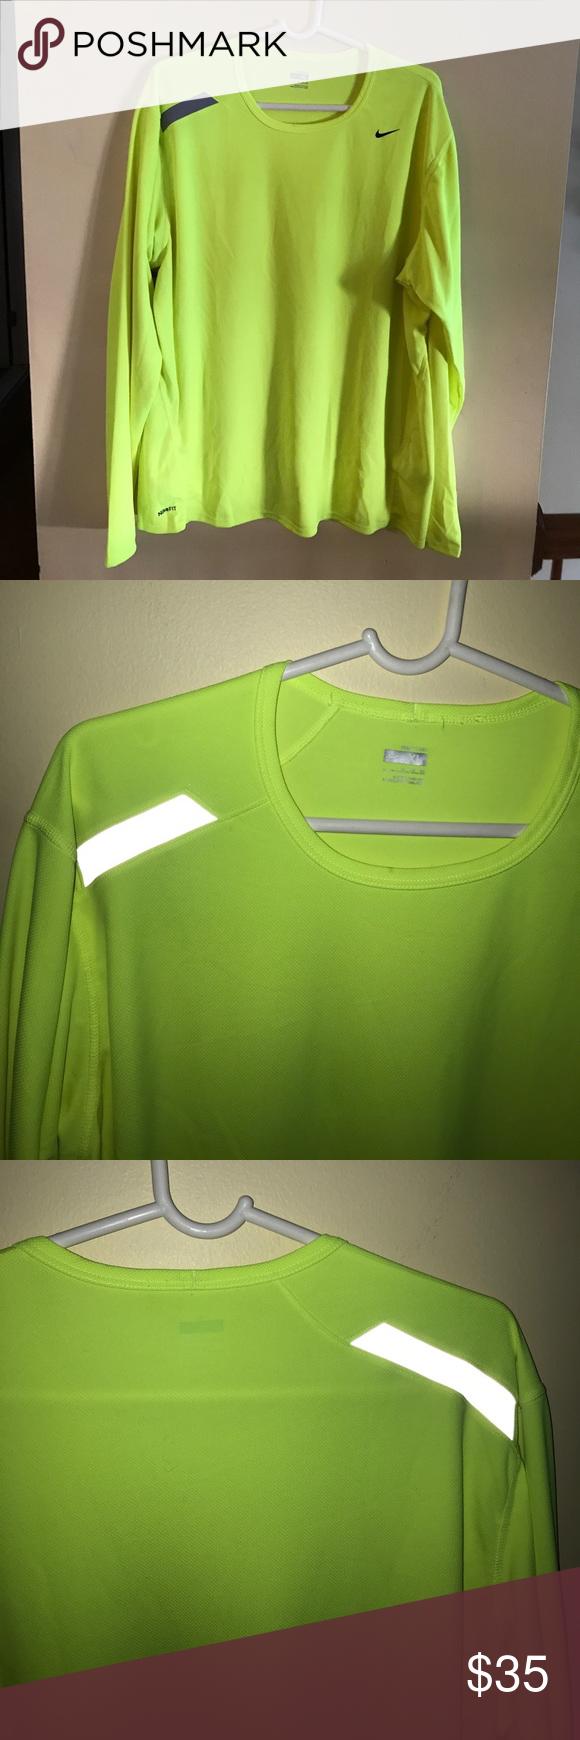 409a4aac4 Nike hi vis running shirt Drifit material long sleeved. High visibility  yellow . Can be worn as a base layer. NWOT Nike Shirts Tees - Long Sleeve